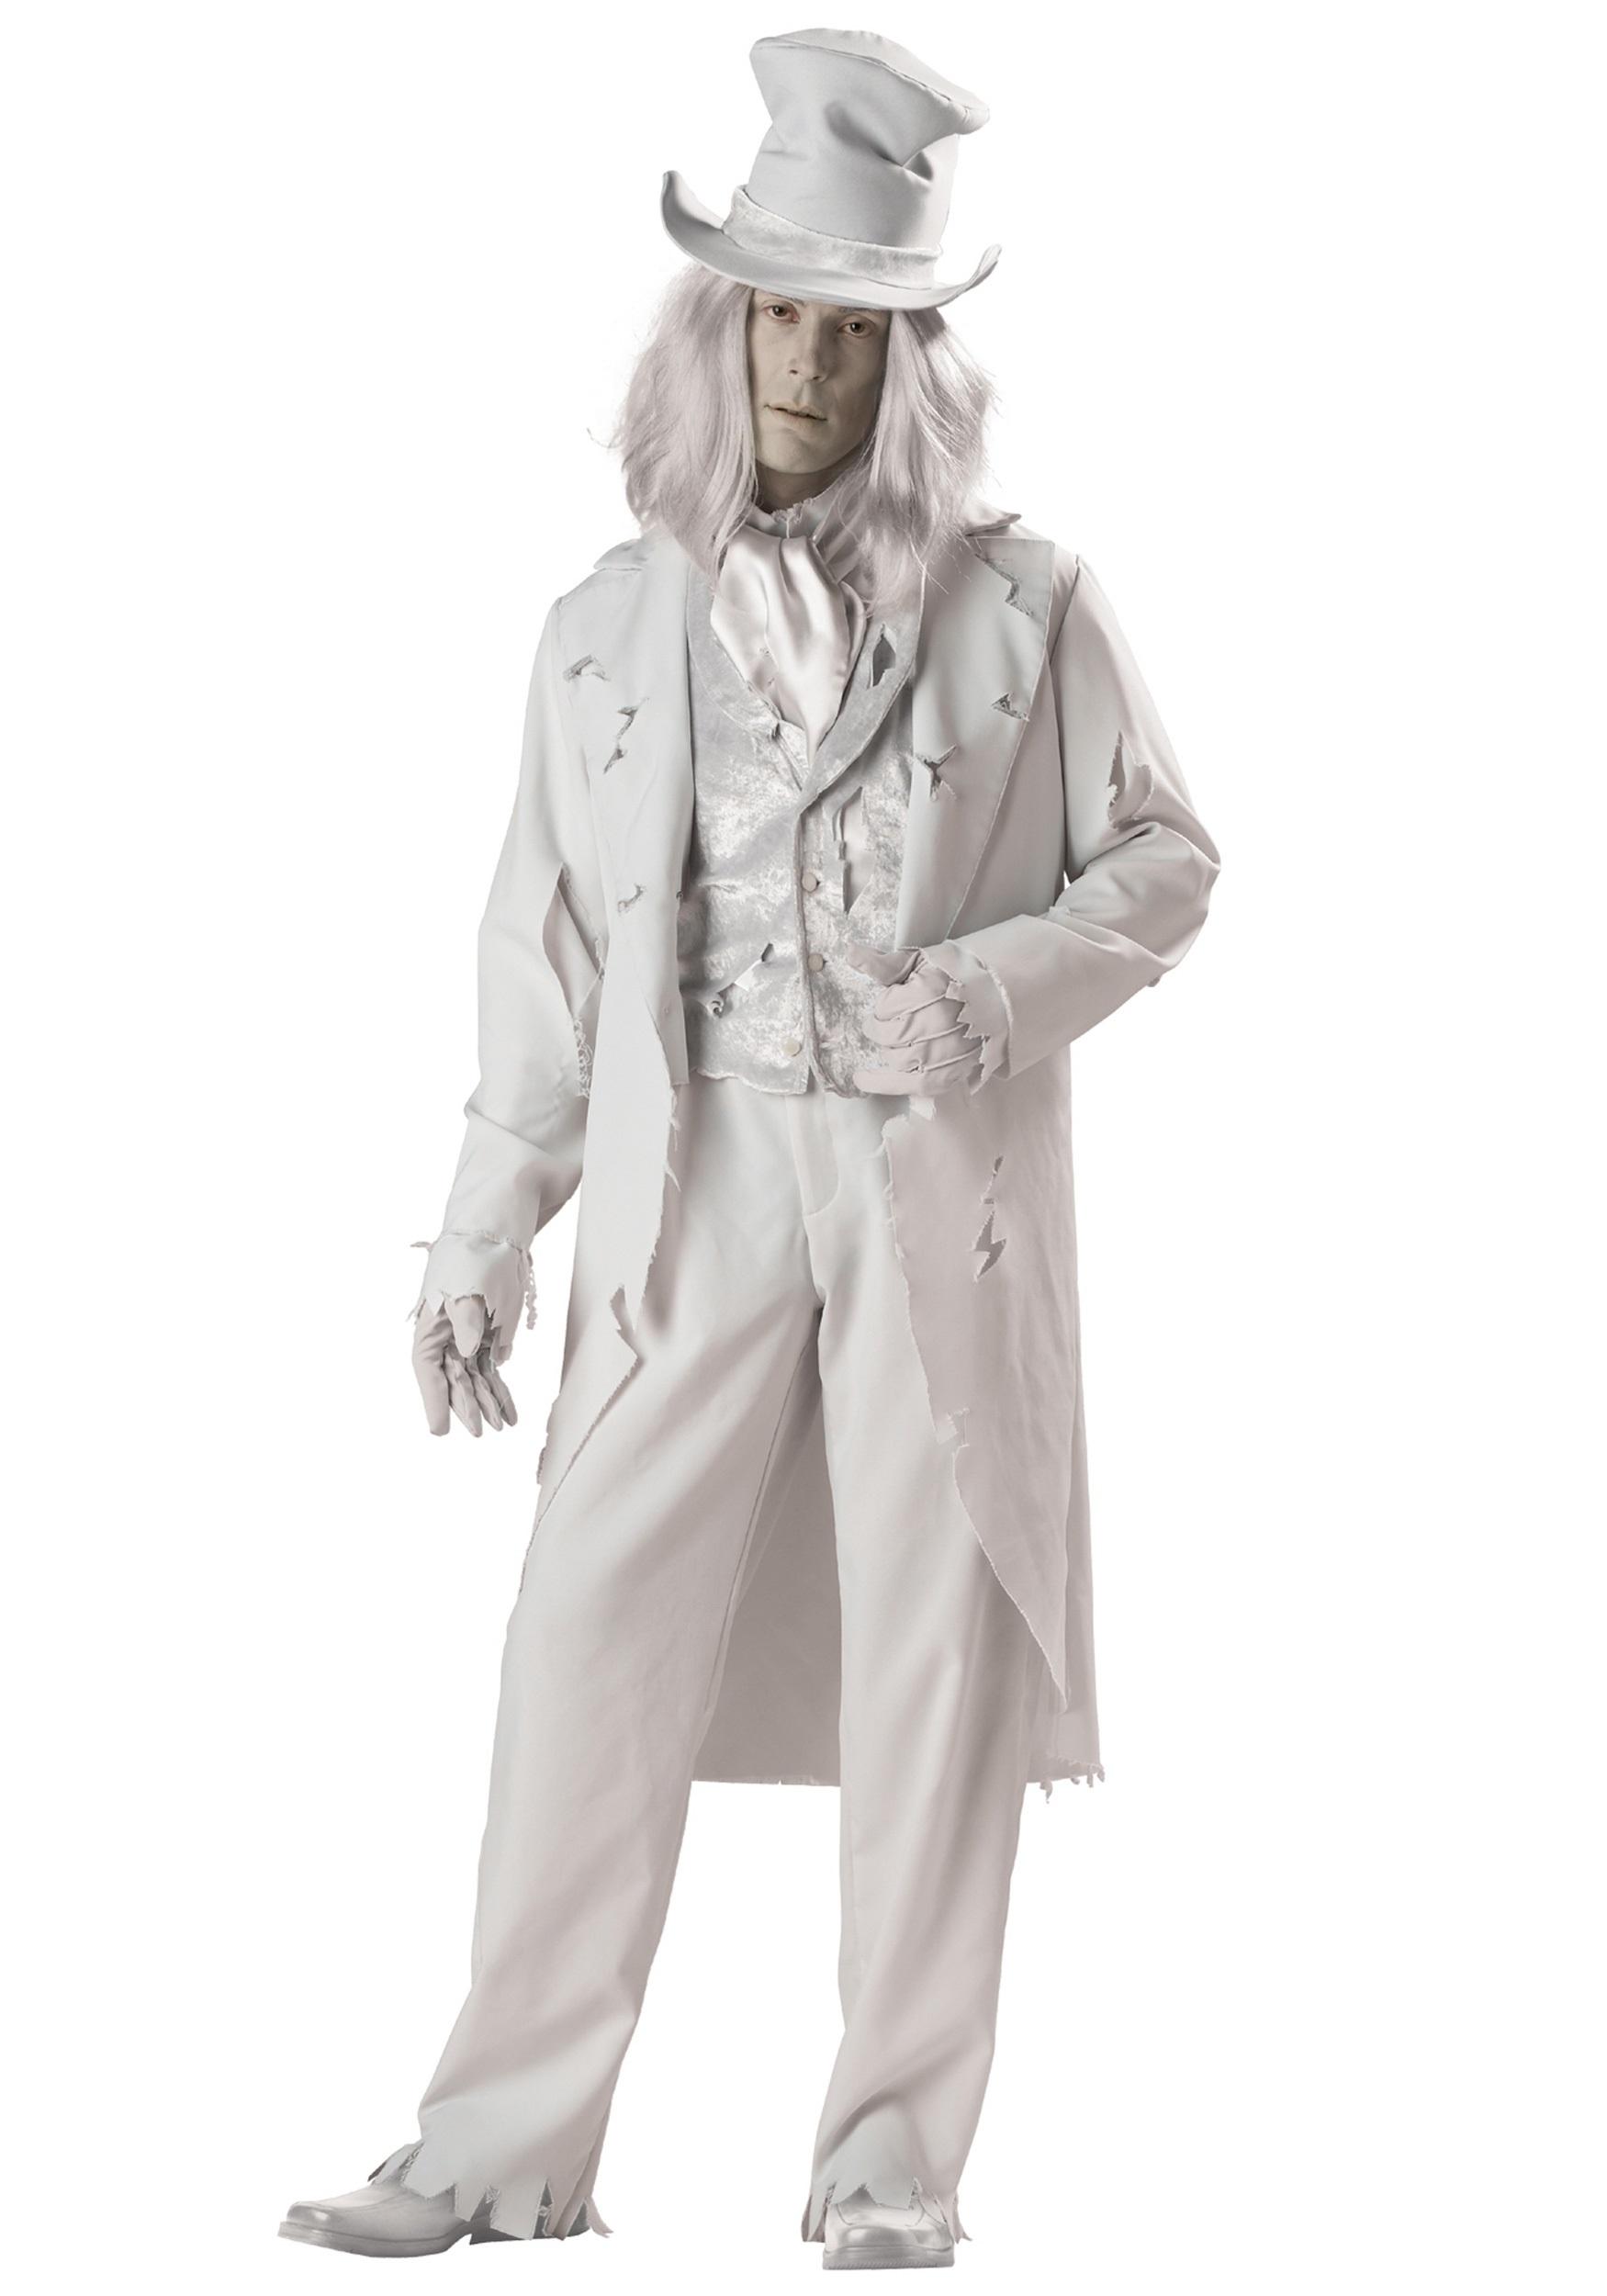 Adulto Uomo Spettrale Sposo Costume Gentleman Halloween Completo Grigio